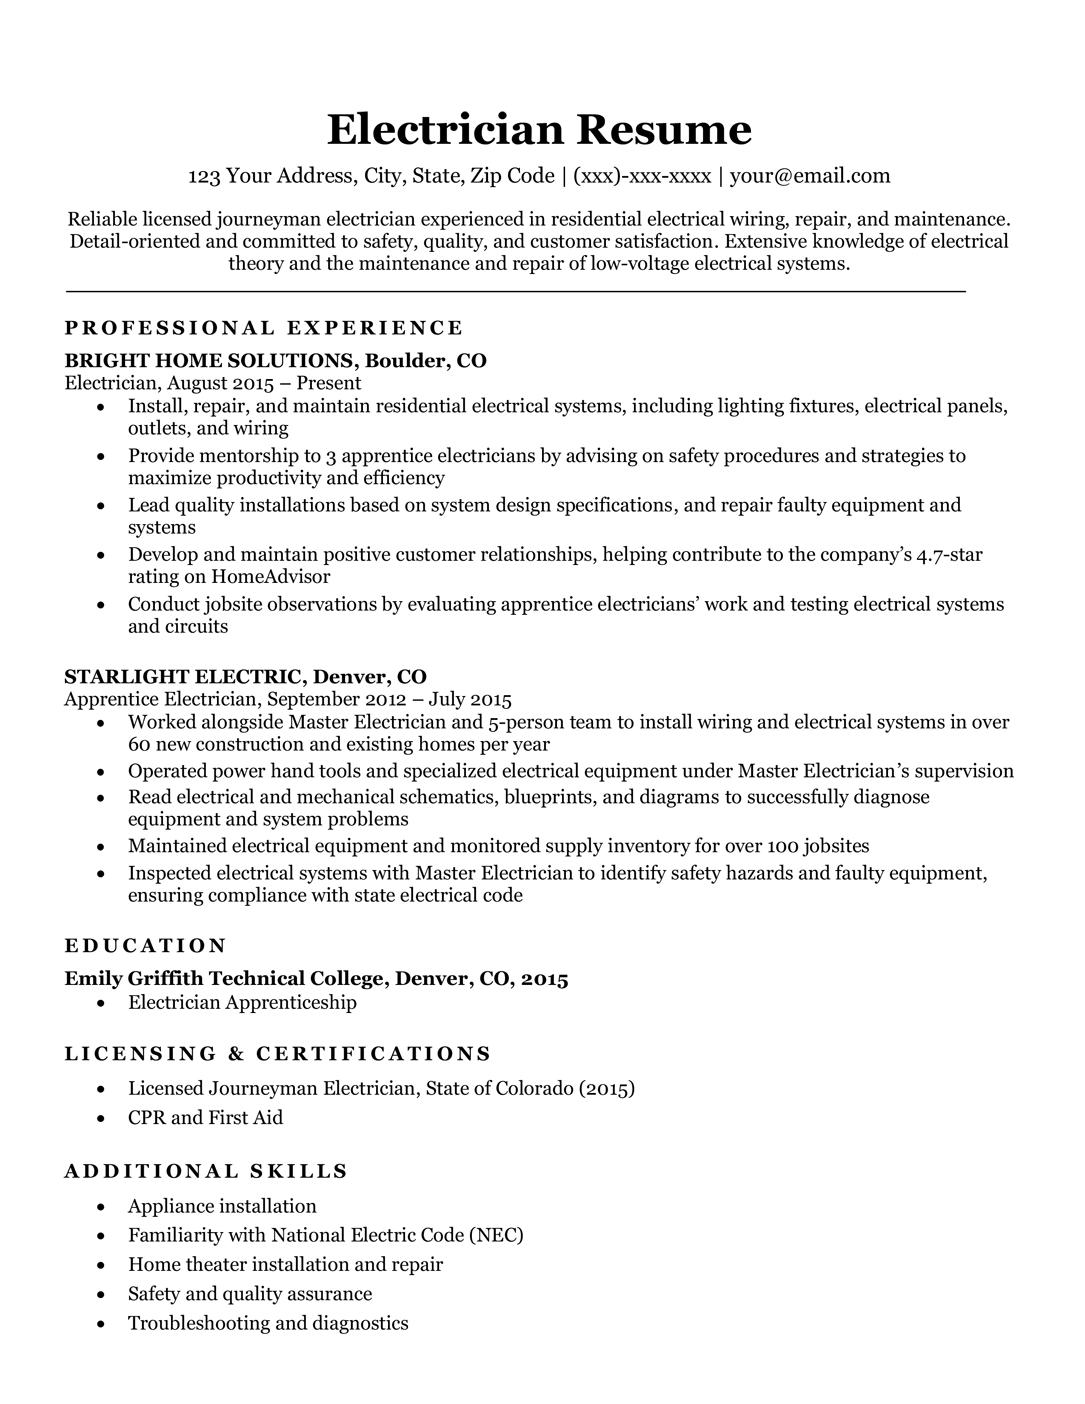 resume sample detail oriented